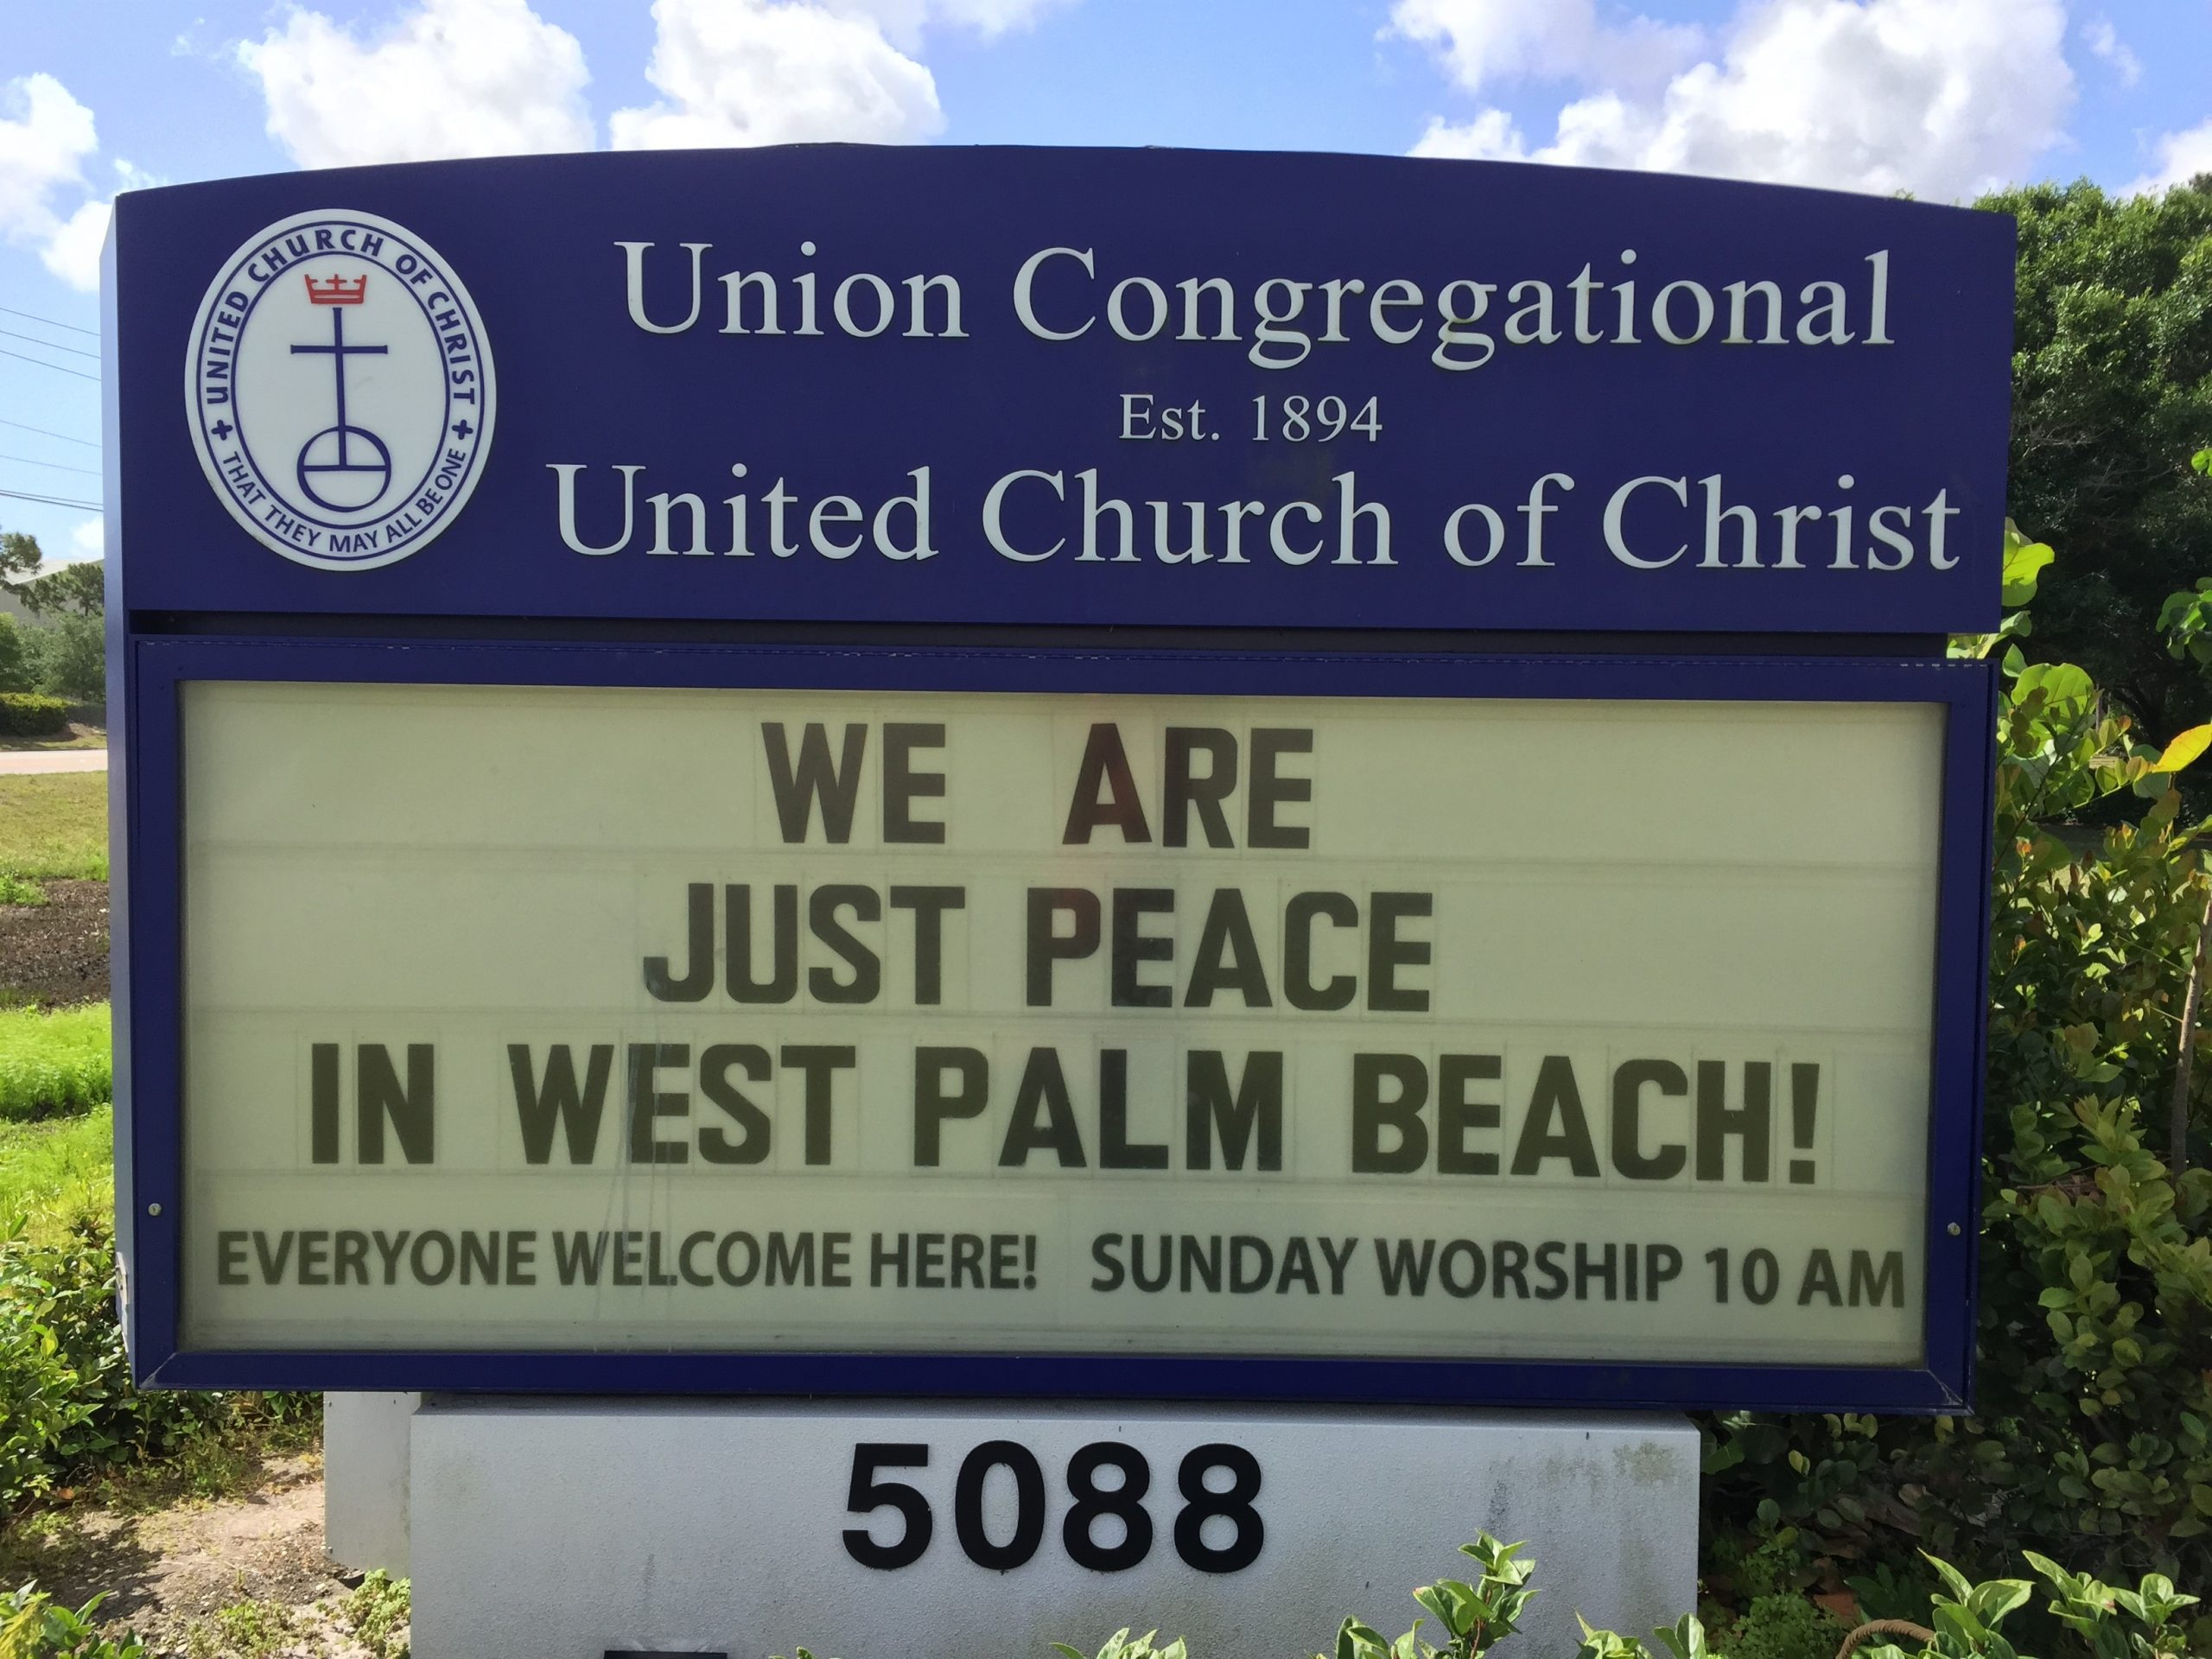 Union Congregational UCC church sign